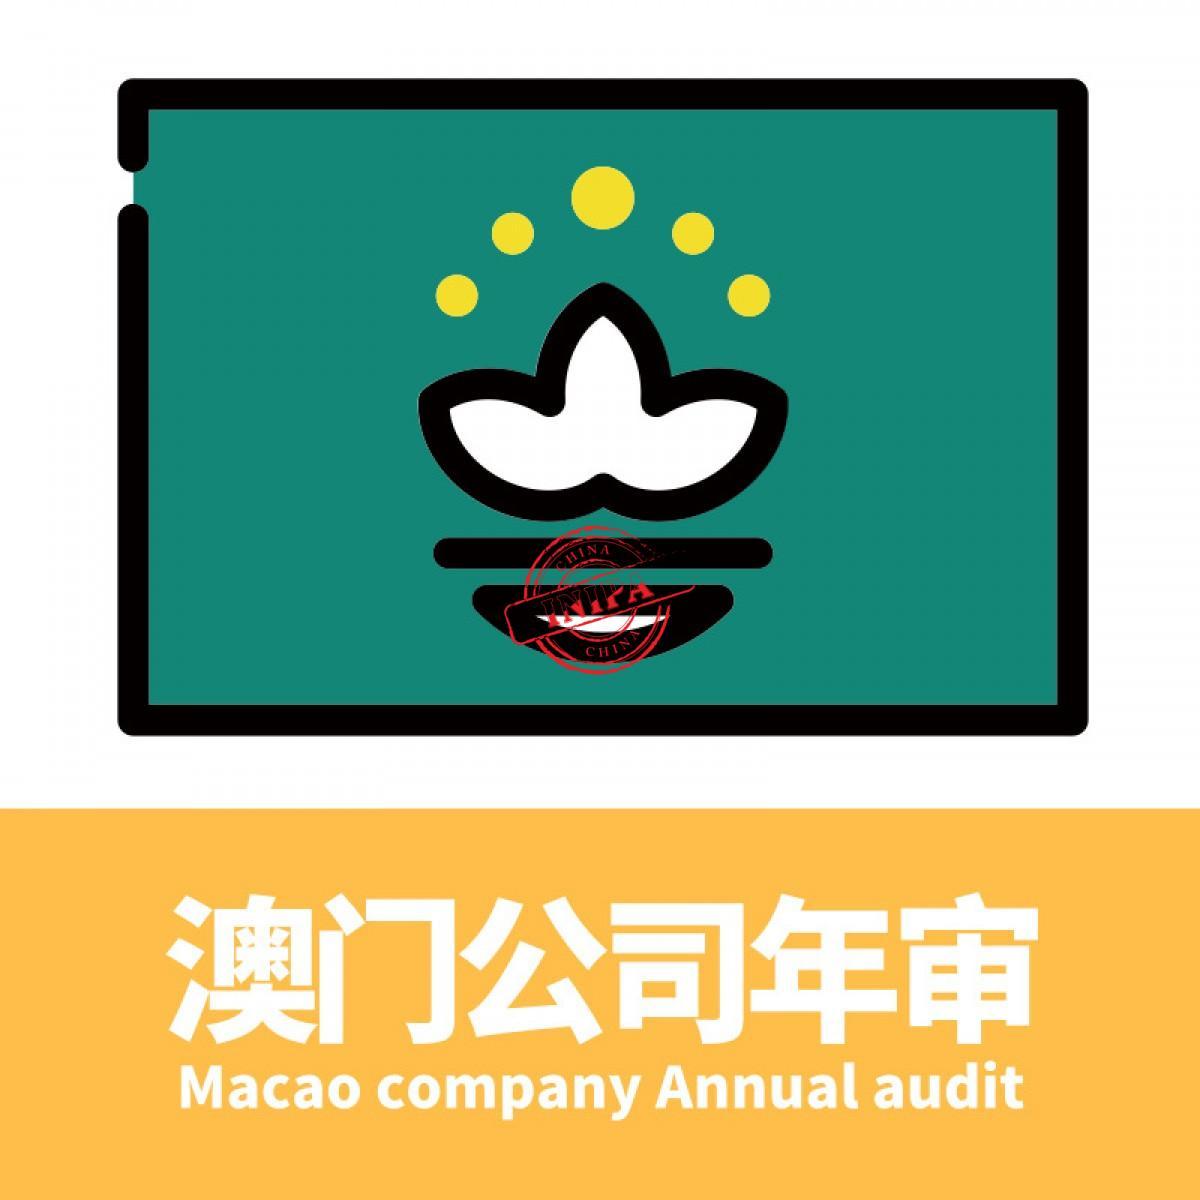 澳门公司年审/Macao company annual review